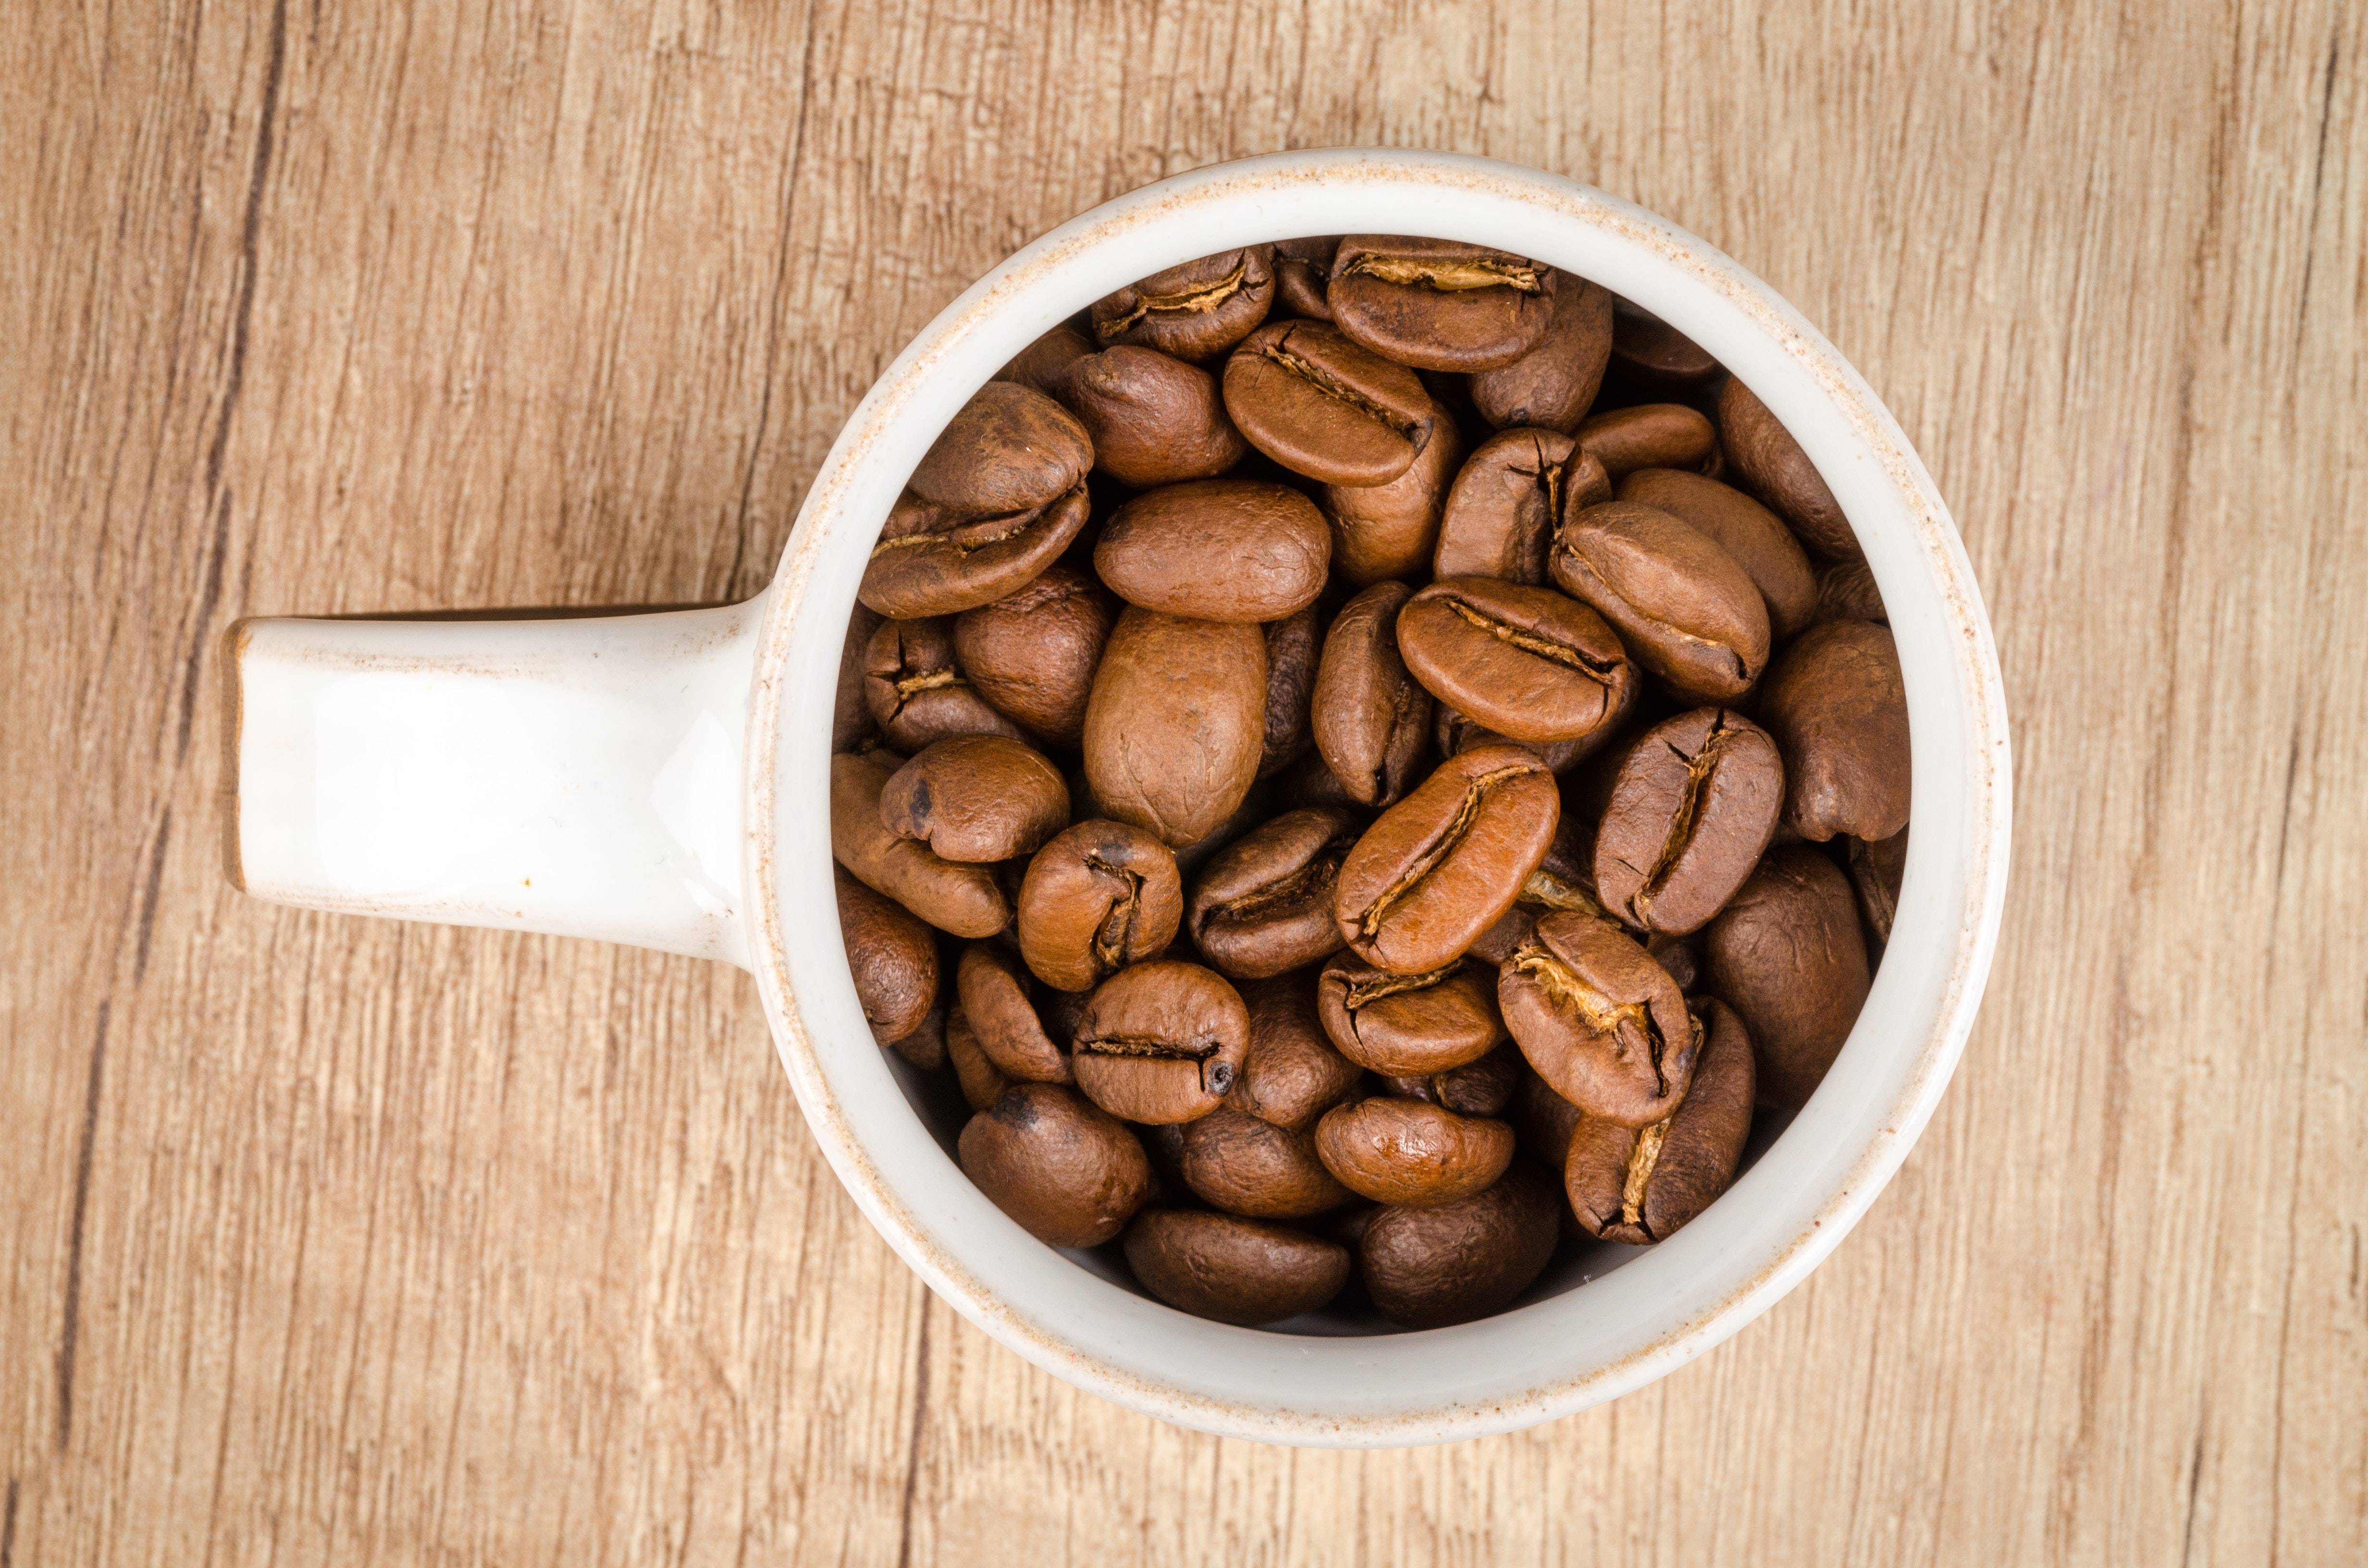 Roasted coffee beans inside white ceramic mug photo